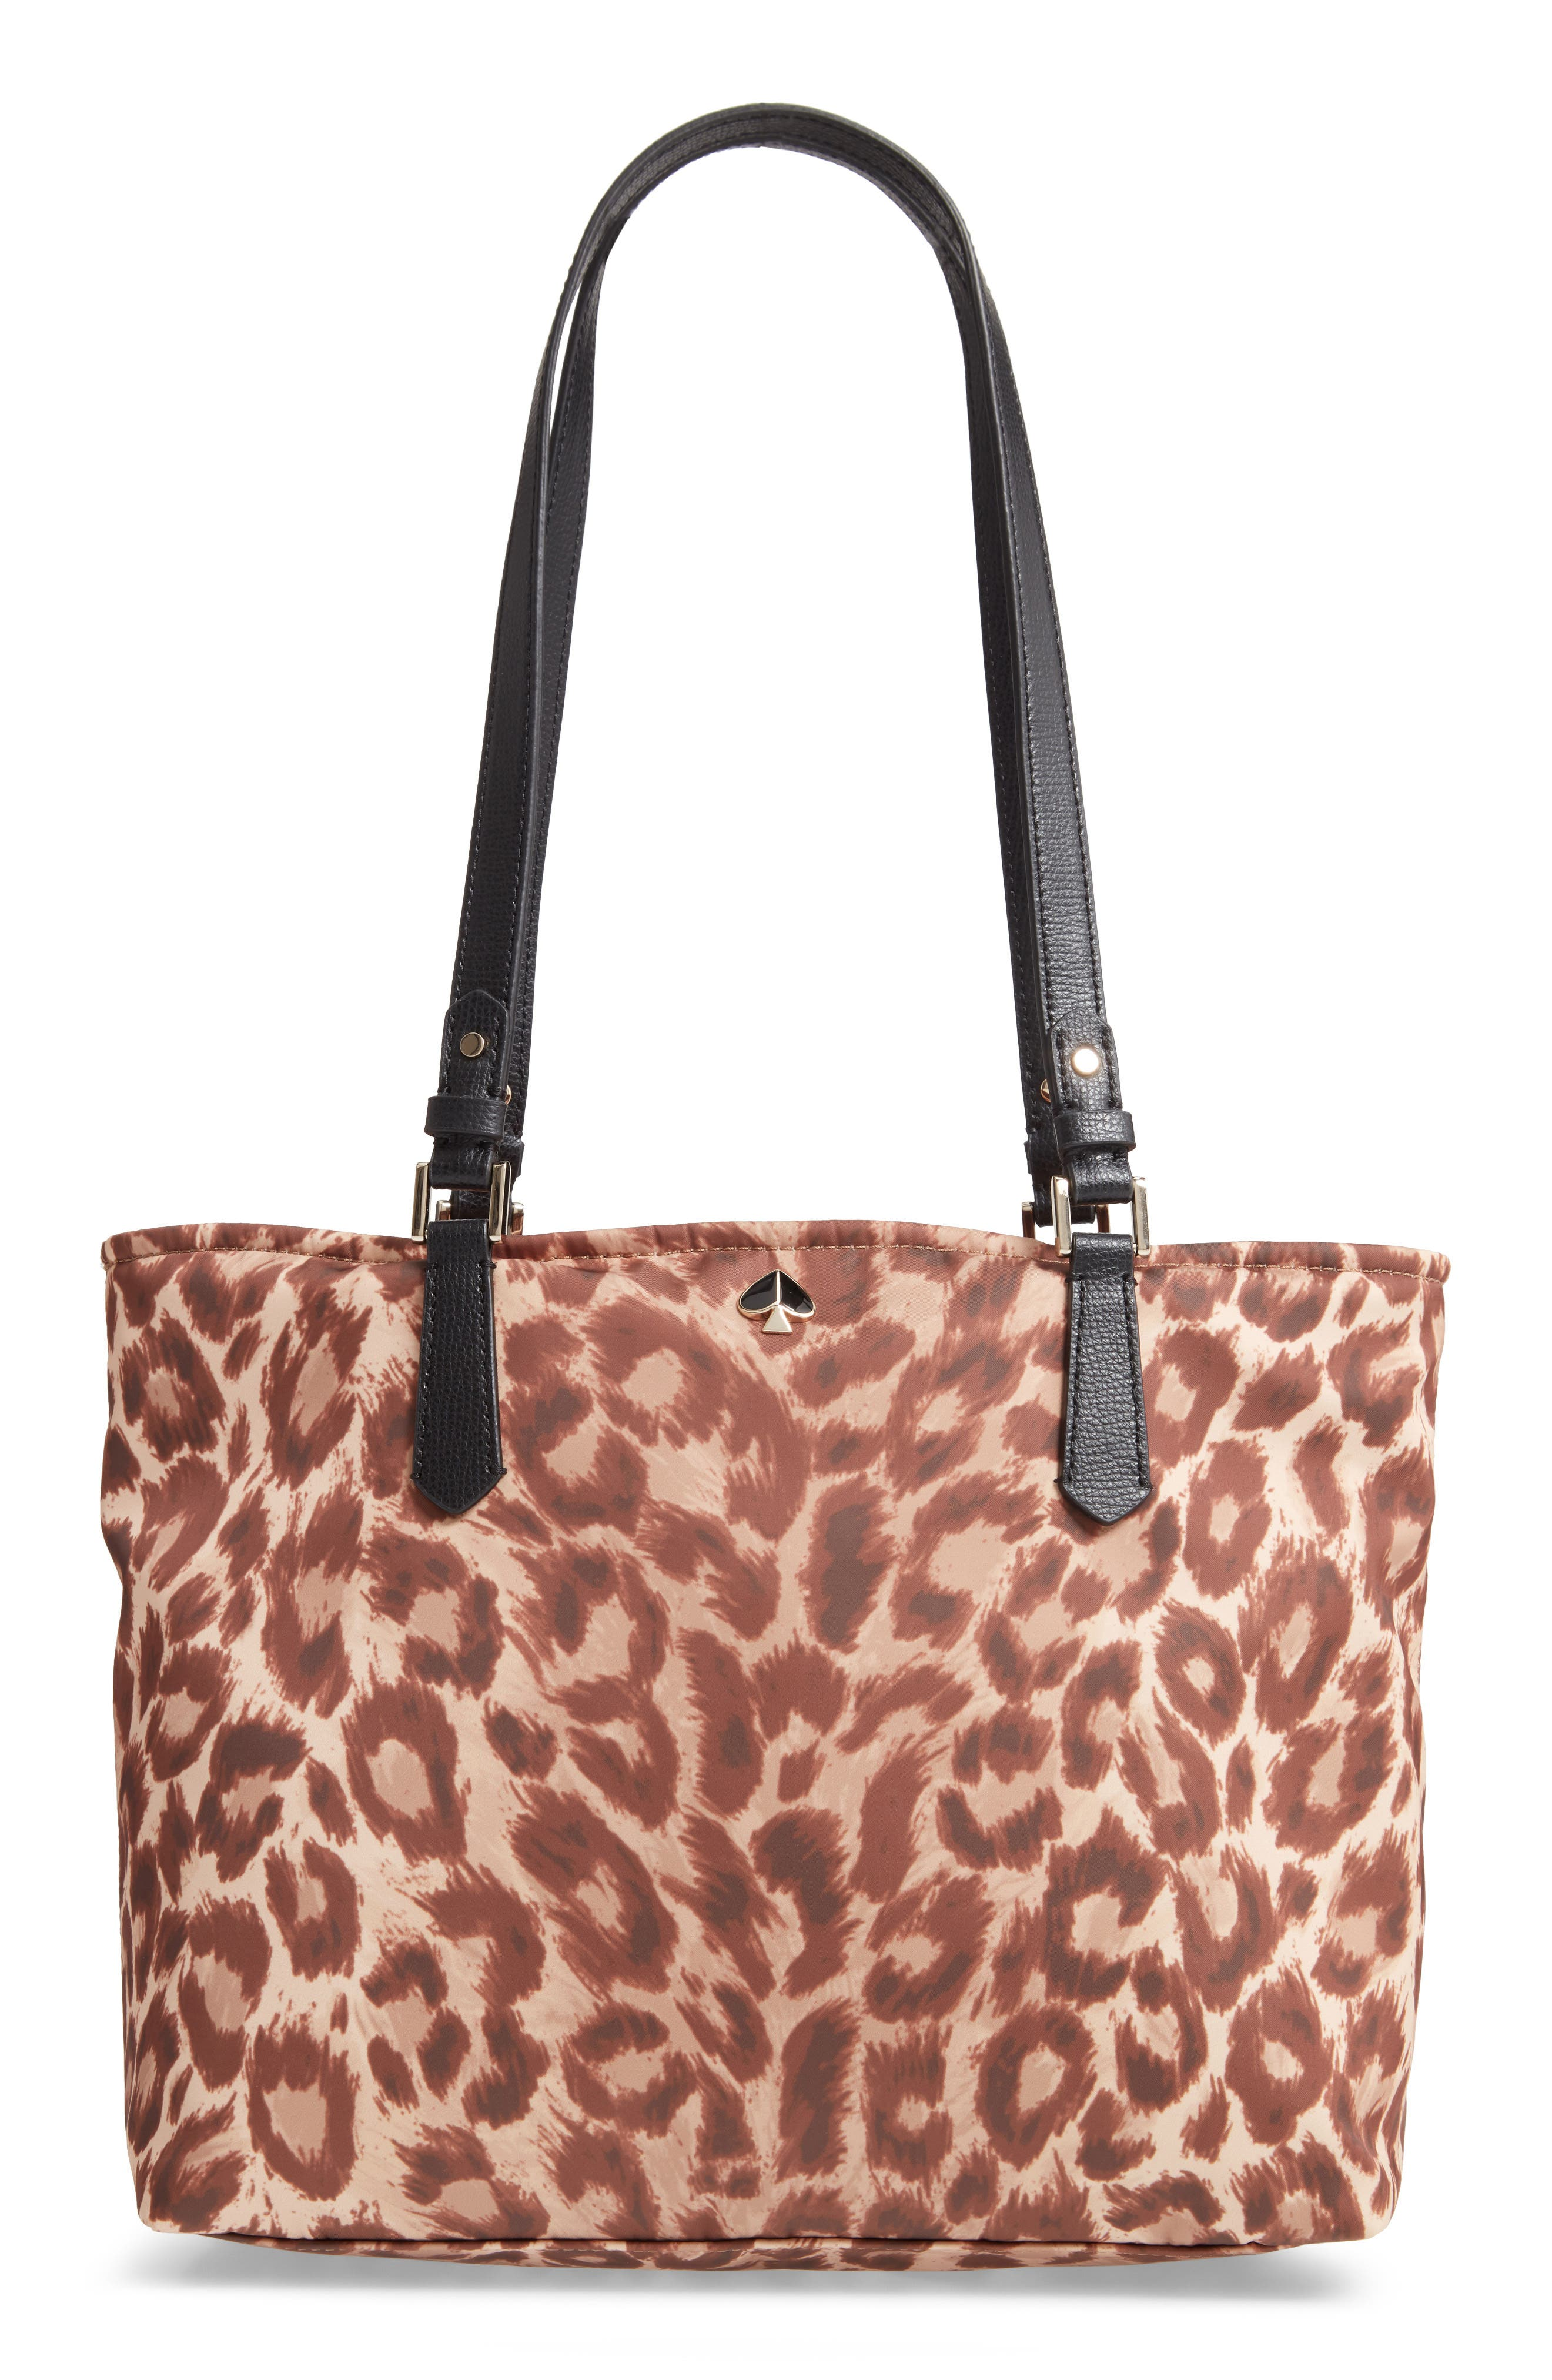 Kate Spade New York Medium Taylor Leopard Nylon Tote